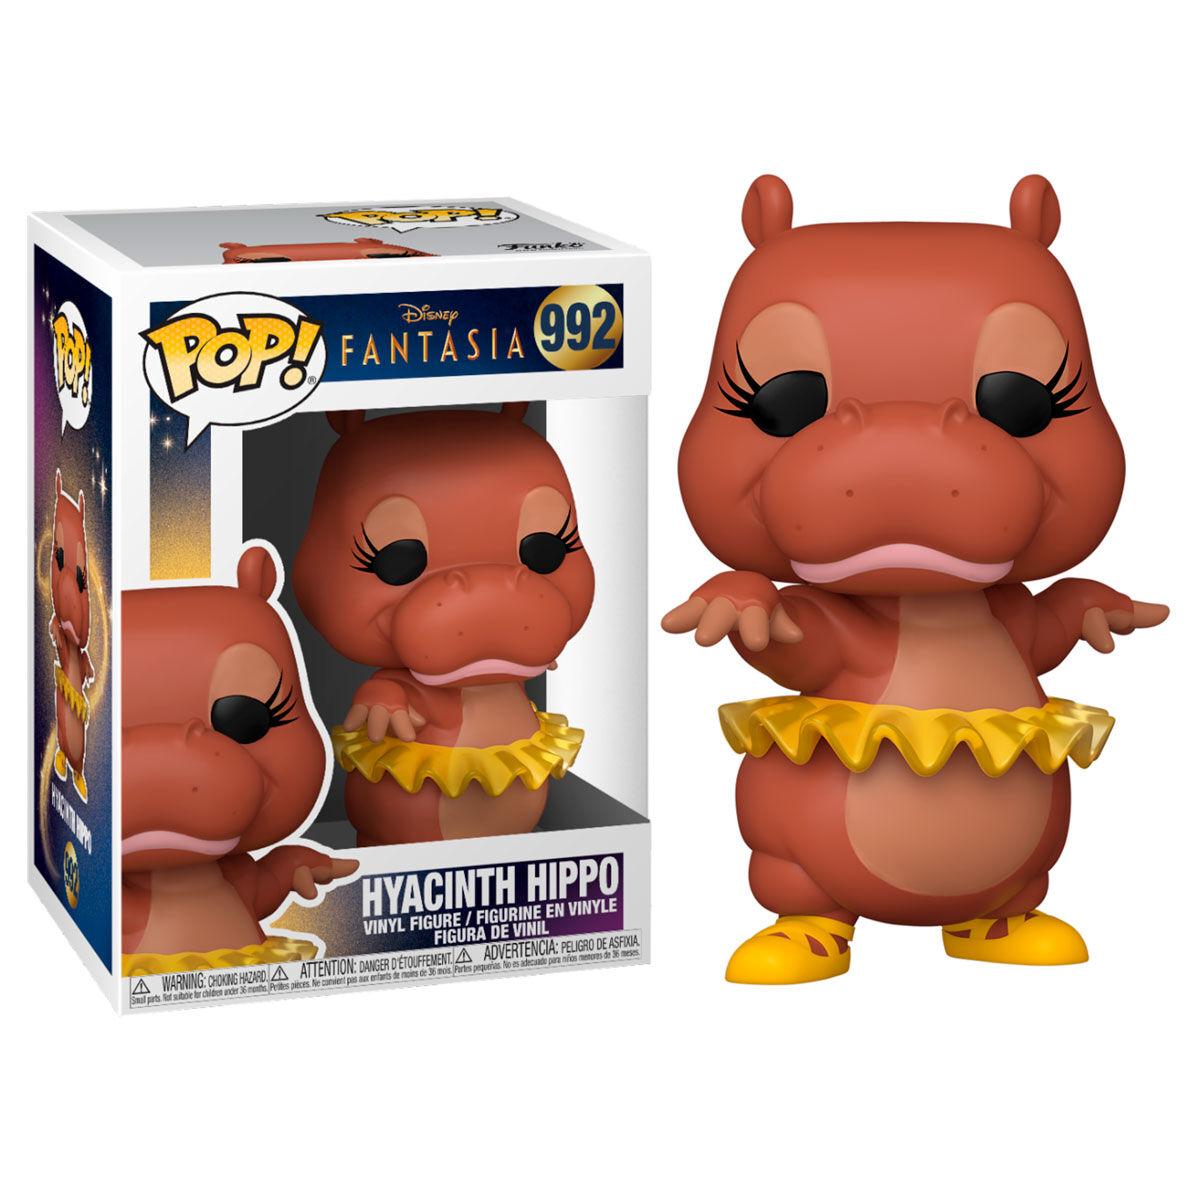 Funko POP o Figura POP Disney Fantasia 80th Hyacinth Hippo